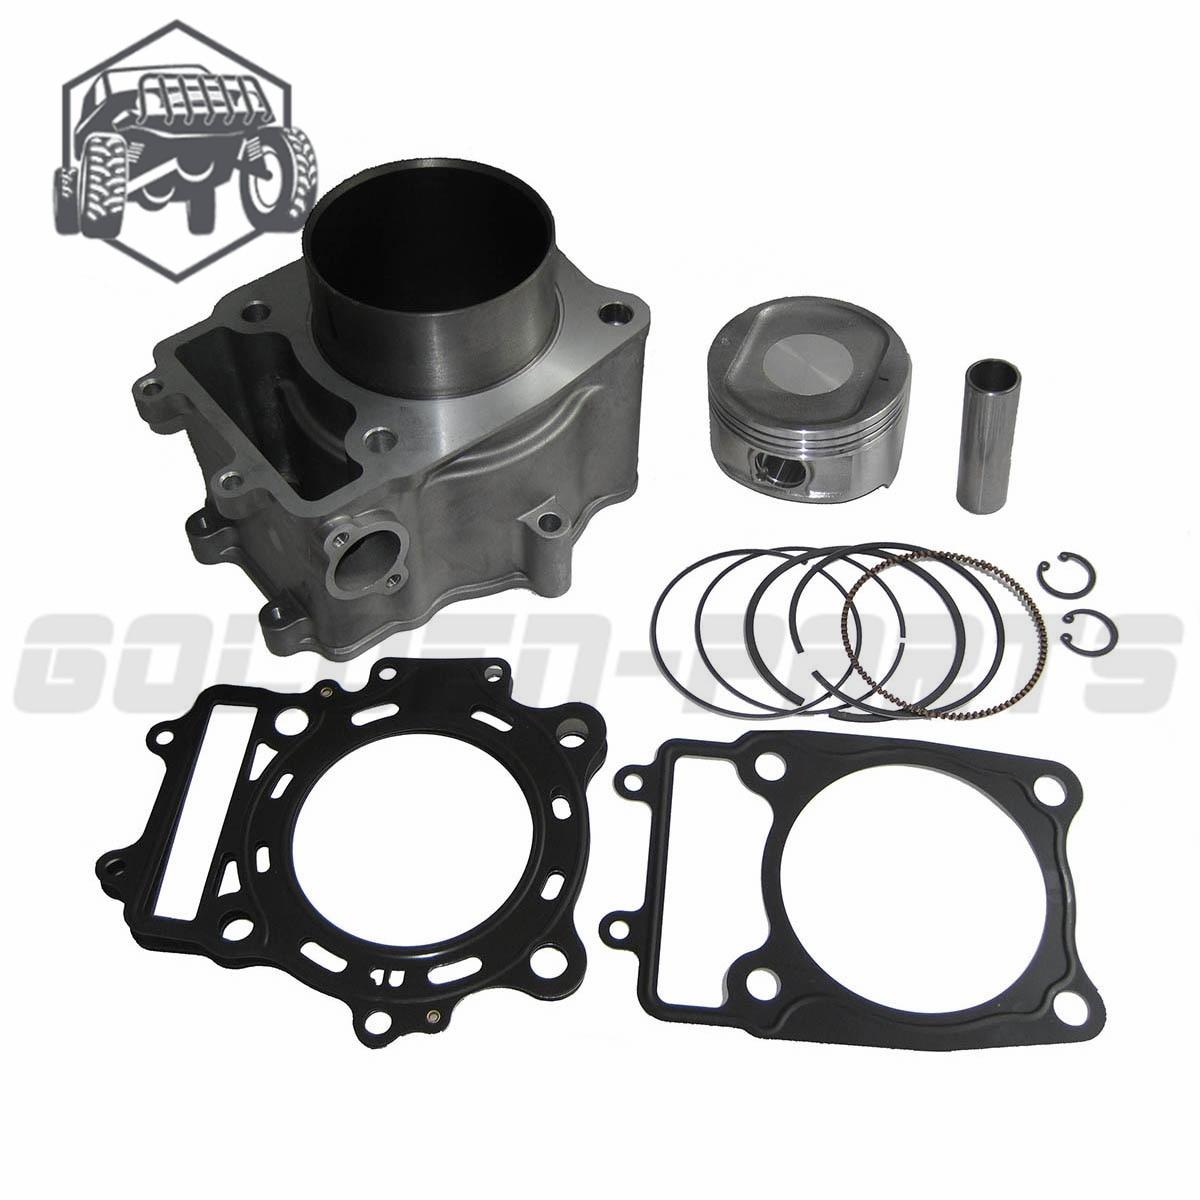 87,5mm Zylinder Kolben Dichtung Kit Für CFMOTO CF188 500 CF500 500CC UTV ATV GO KART 0180-023100